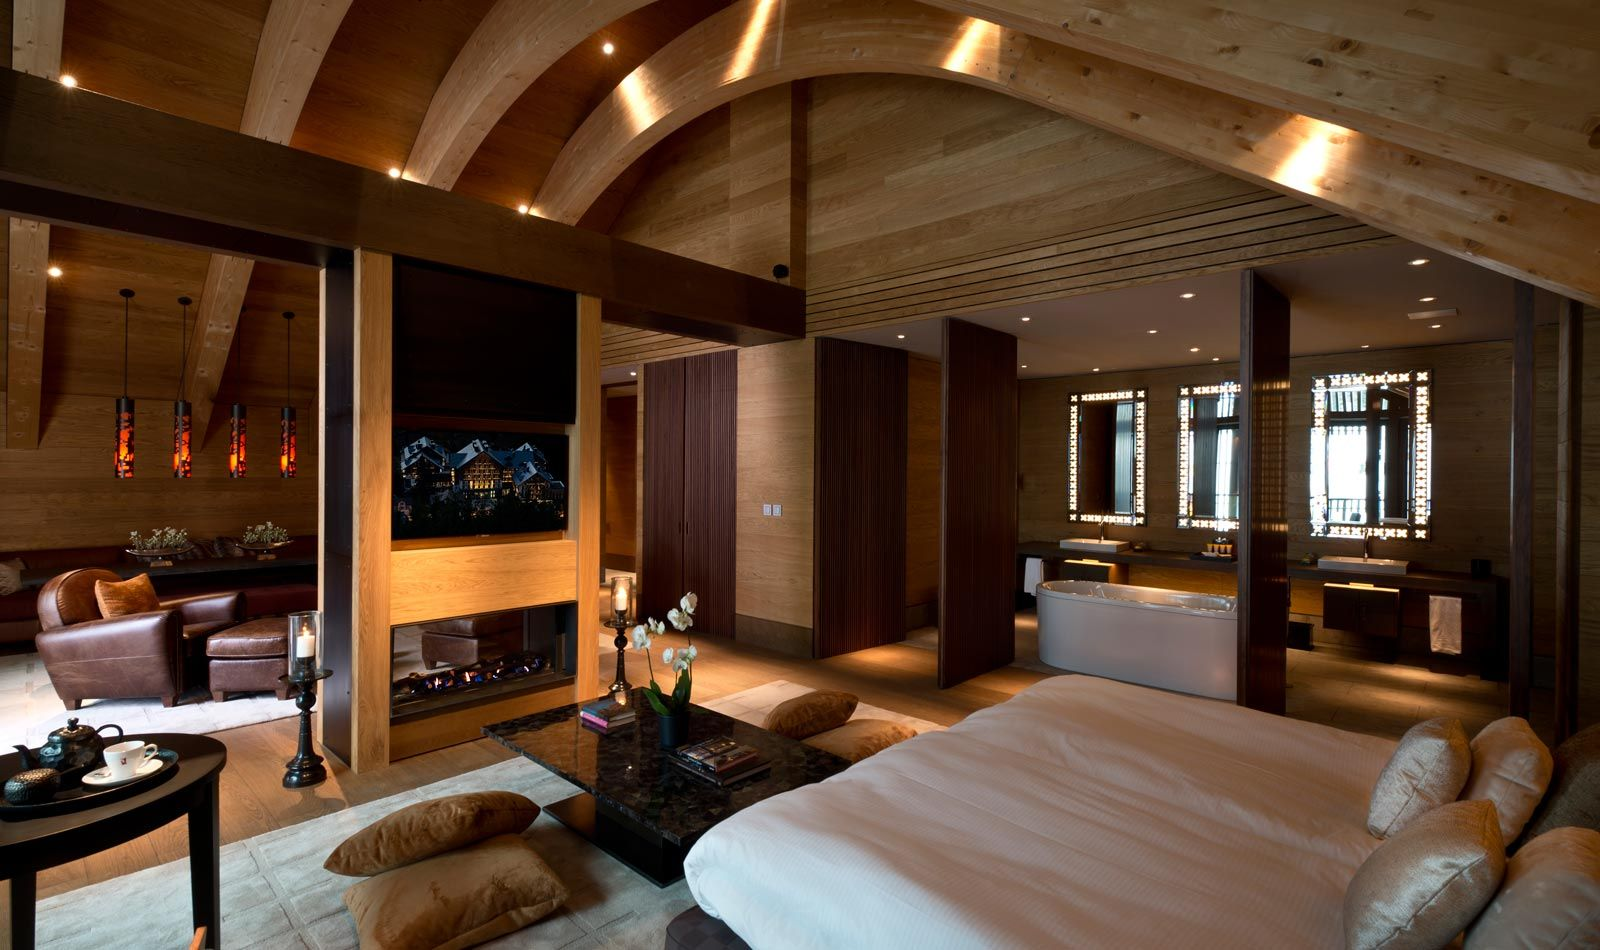 Gemsstock Suite The Chedi Andermatt Luxury Hotel Switzerland